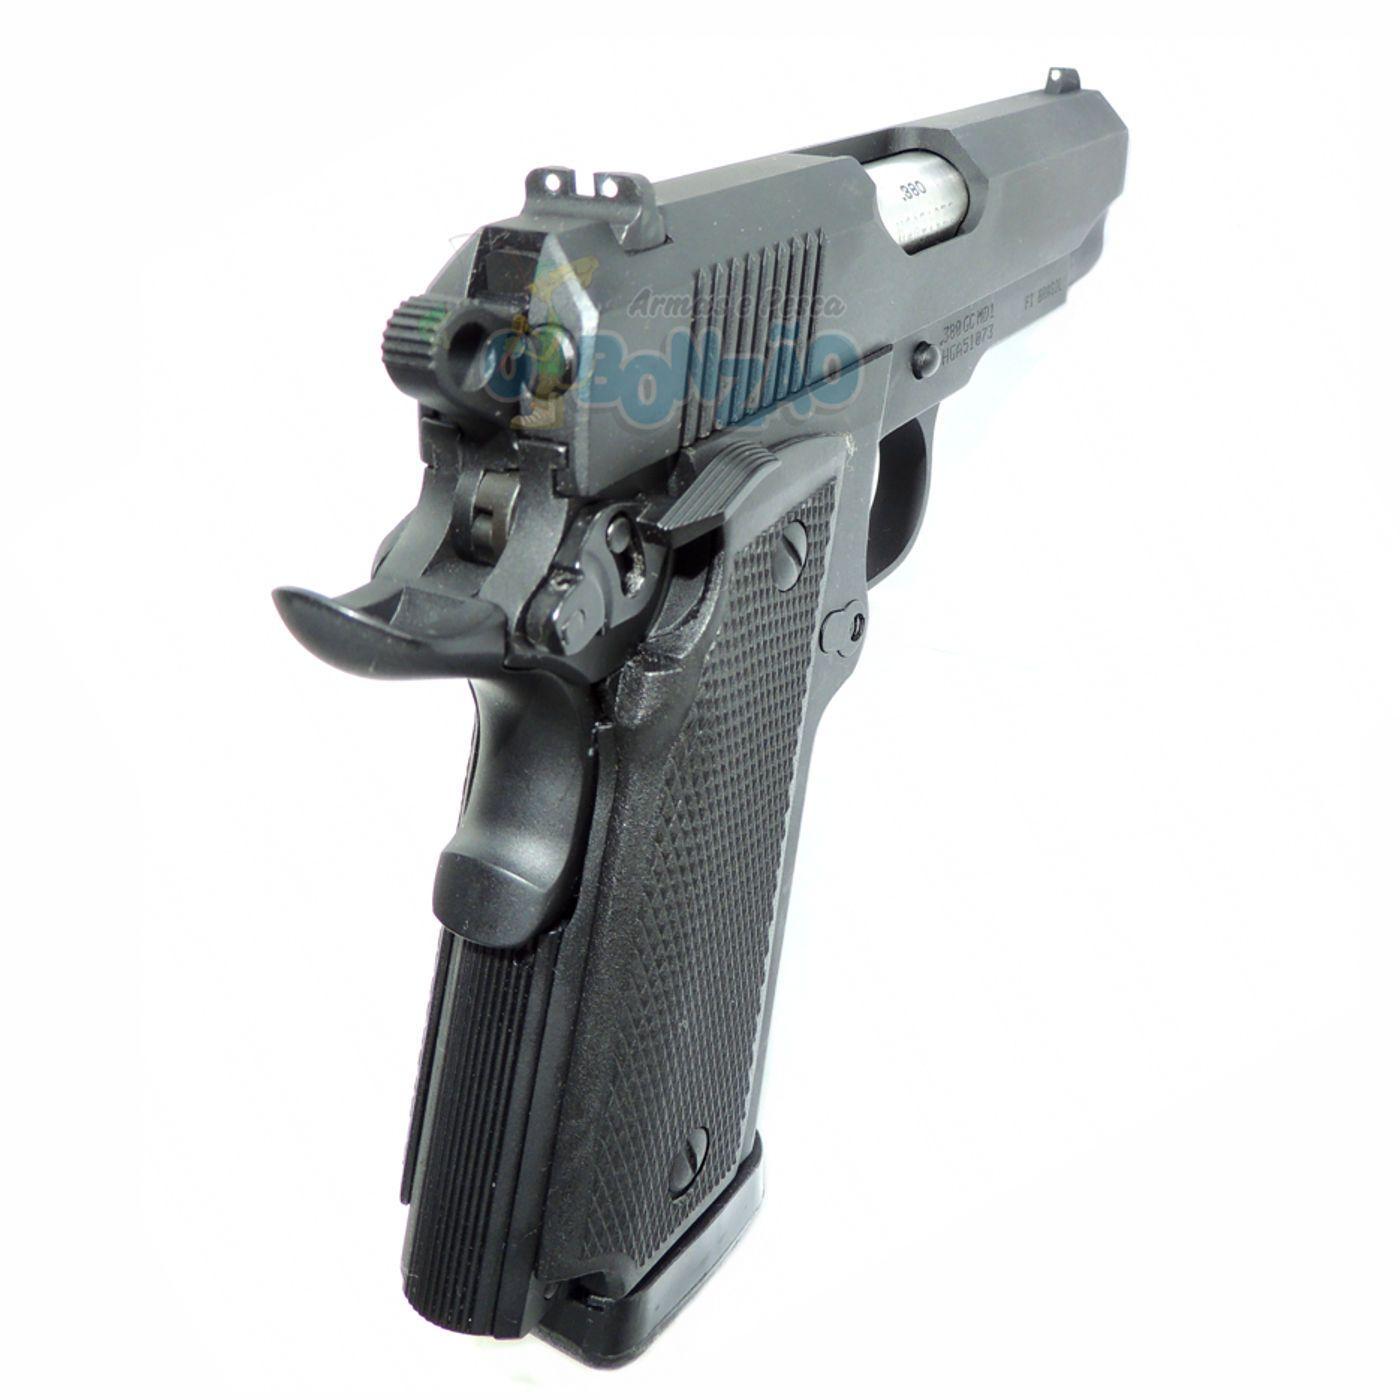 Pistola Imbel MD1 GC ADC Cal .380 ACP 19+1 Tiros Oxidada Preta